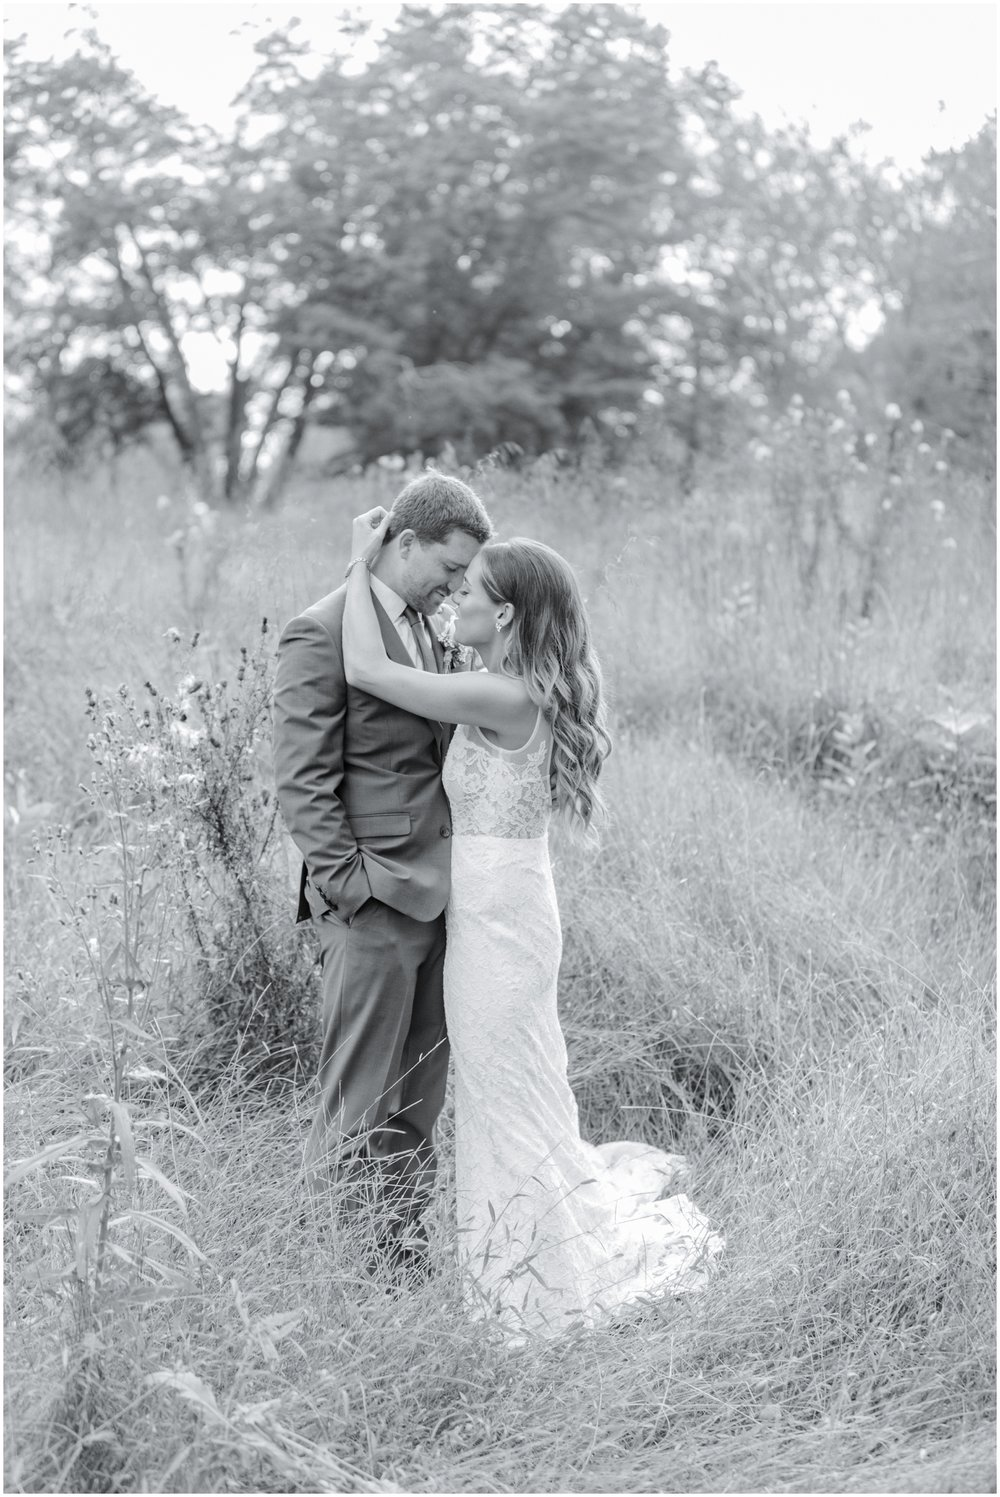 Summer Wedding at Philander Chase Knox Estate in Malvern, PA - Krista Brackin Photography_0074.jpg